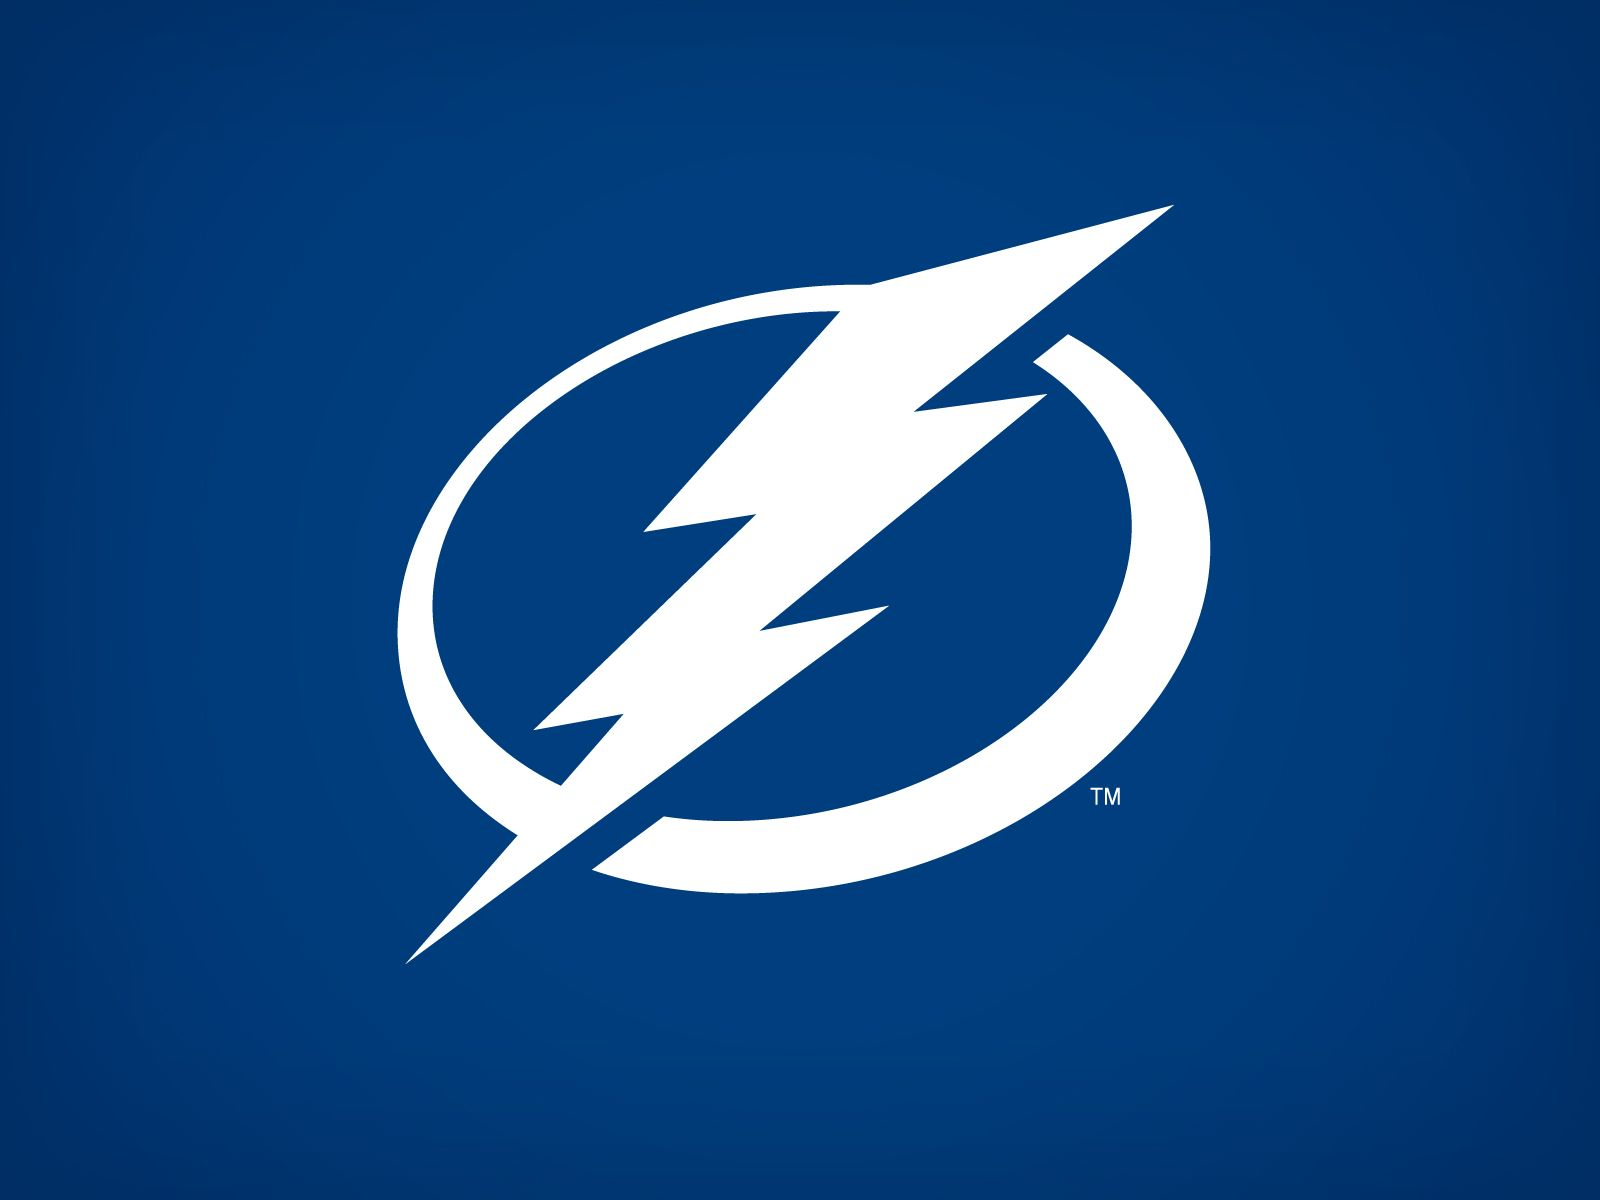 Tampa Bay Lightning Logo Tampa Bay Lightning Logo Tampa Bay